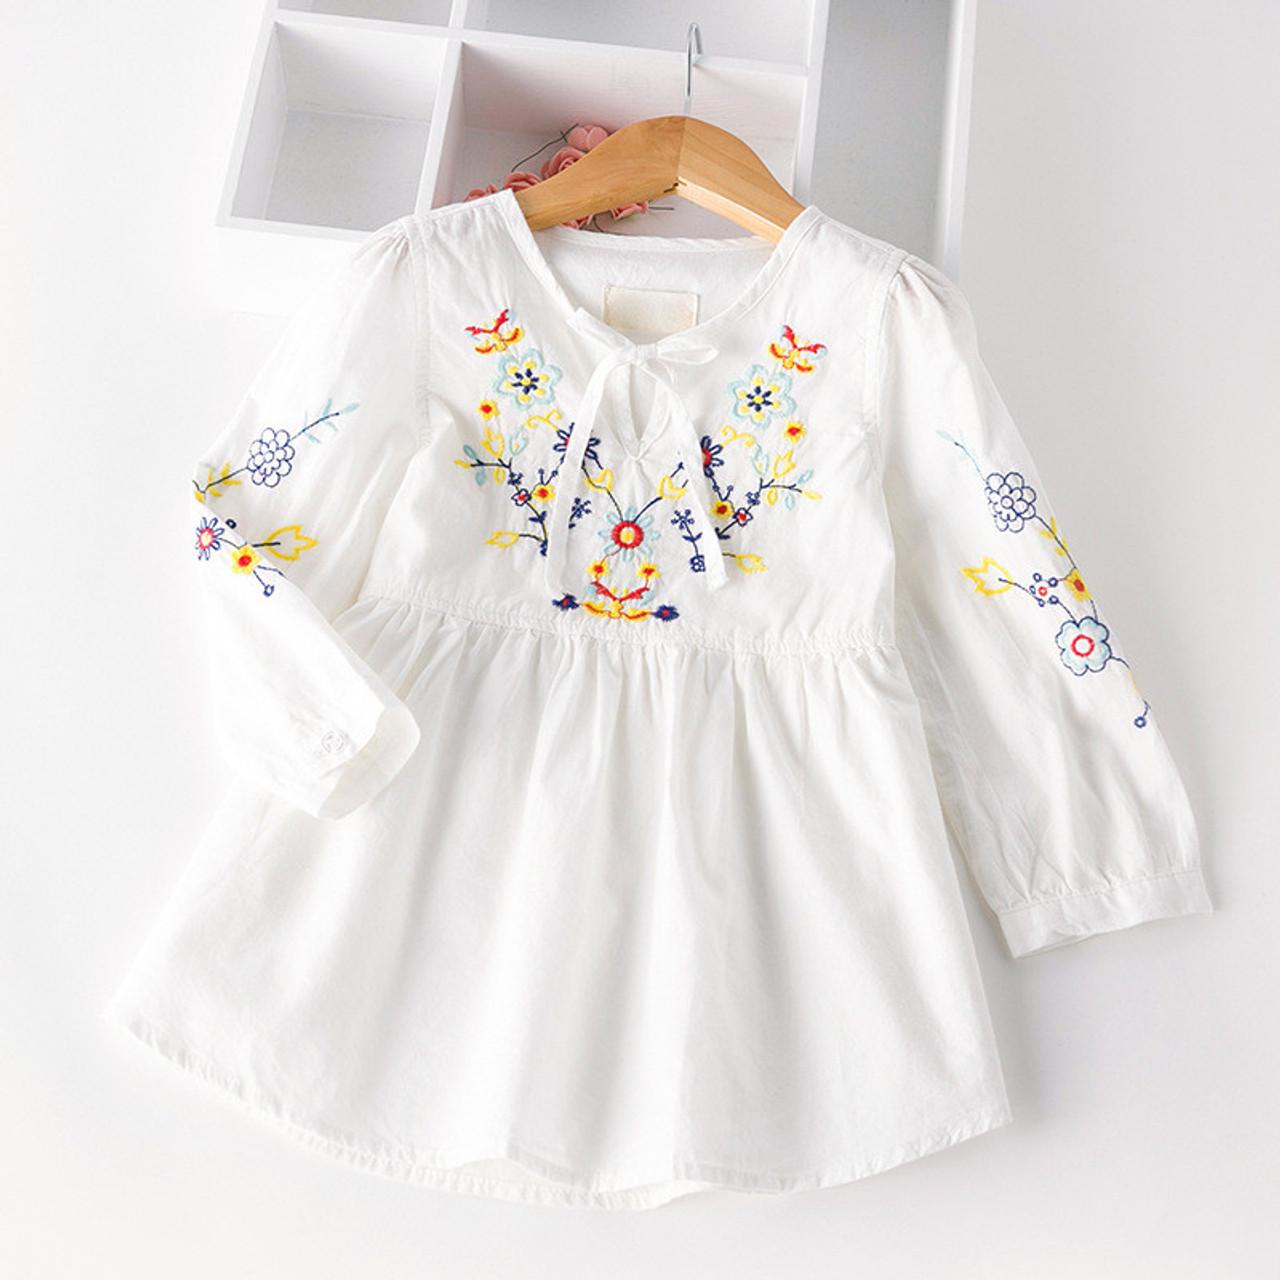 88114ae727d8 Autumn Cotton Denim dress Little Girls floral dress vintage embroidery flower  dresses Toddler Clothing For Party - OnshopDeals.Com